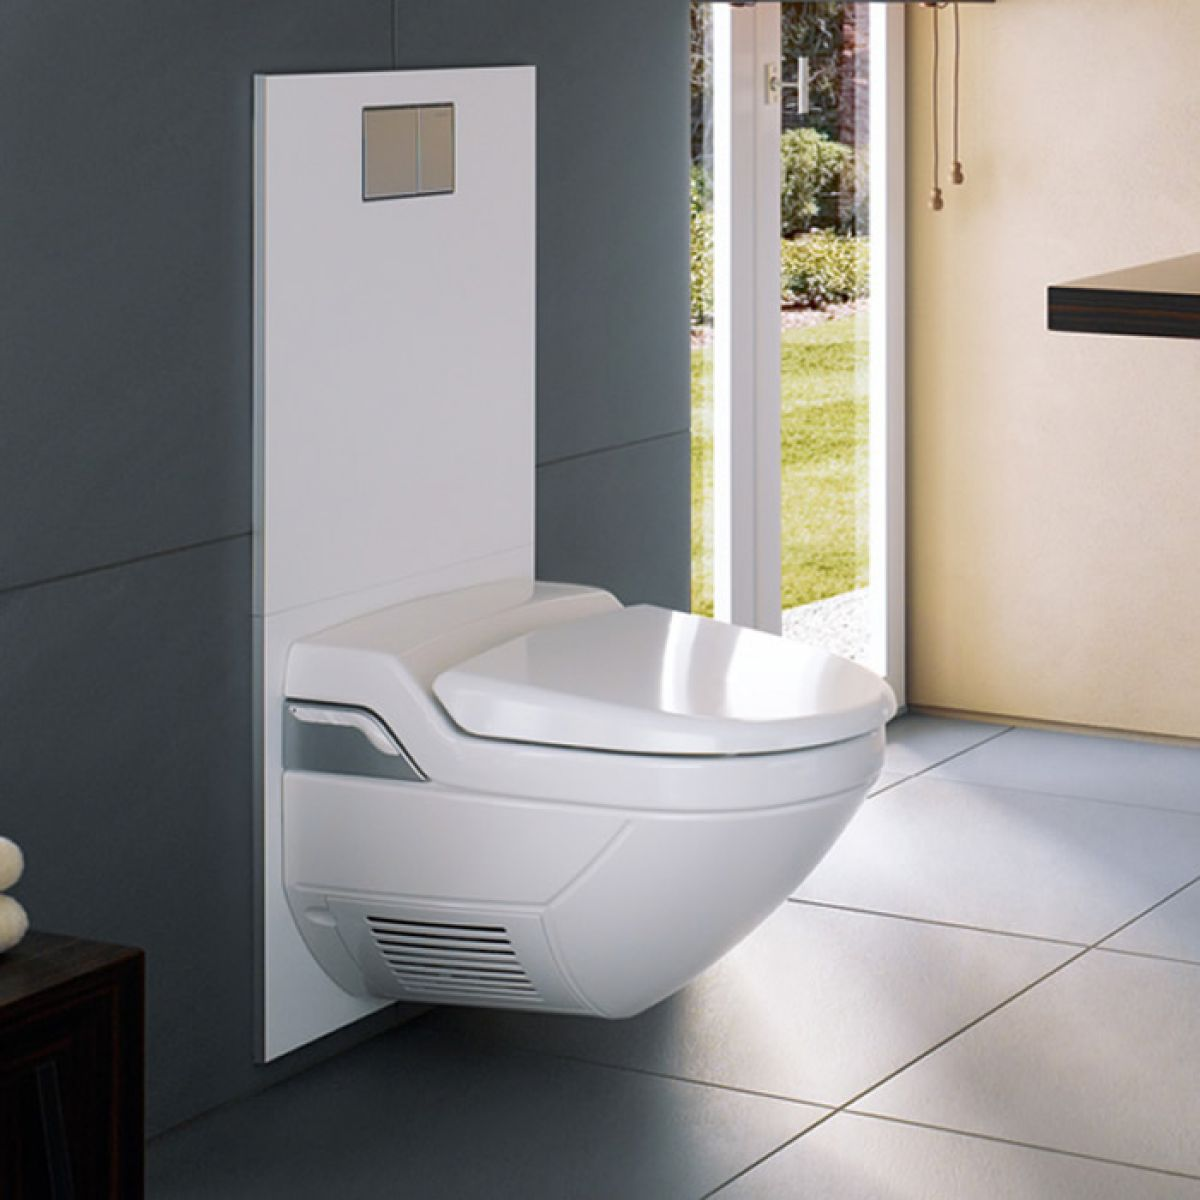 geberit aquaclean complete design cistern cover for 8000. Black Bedroom Furniture Sets. Home Design Ideas